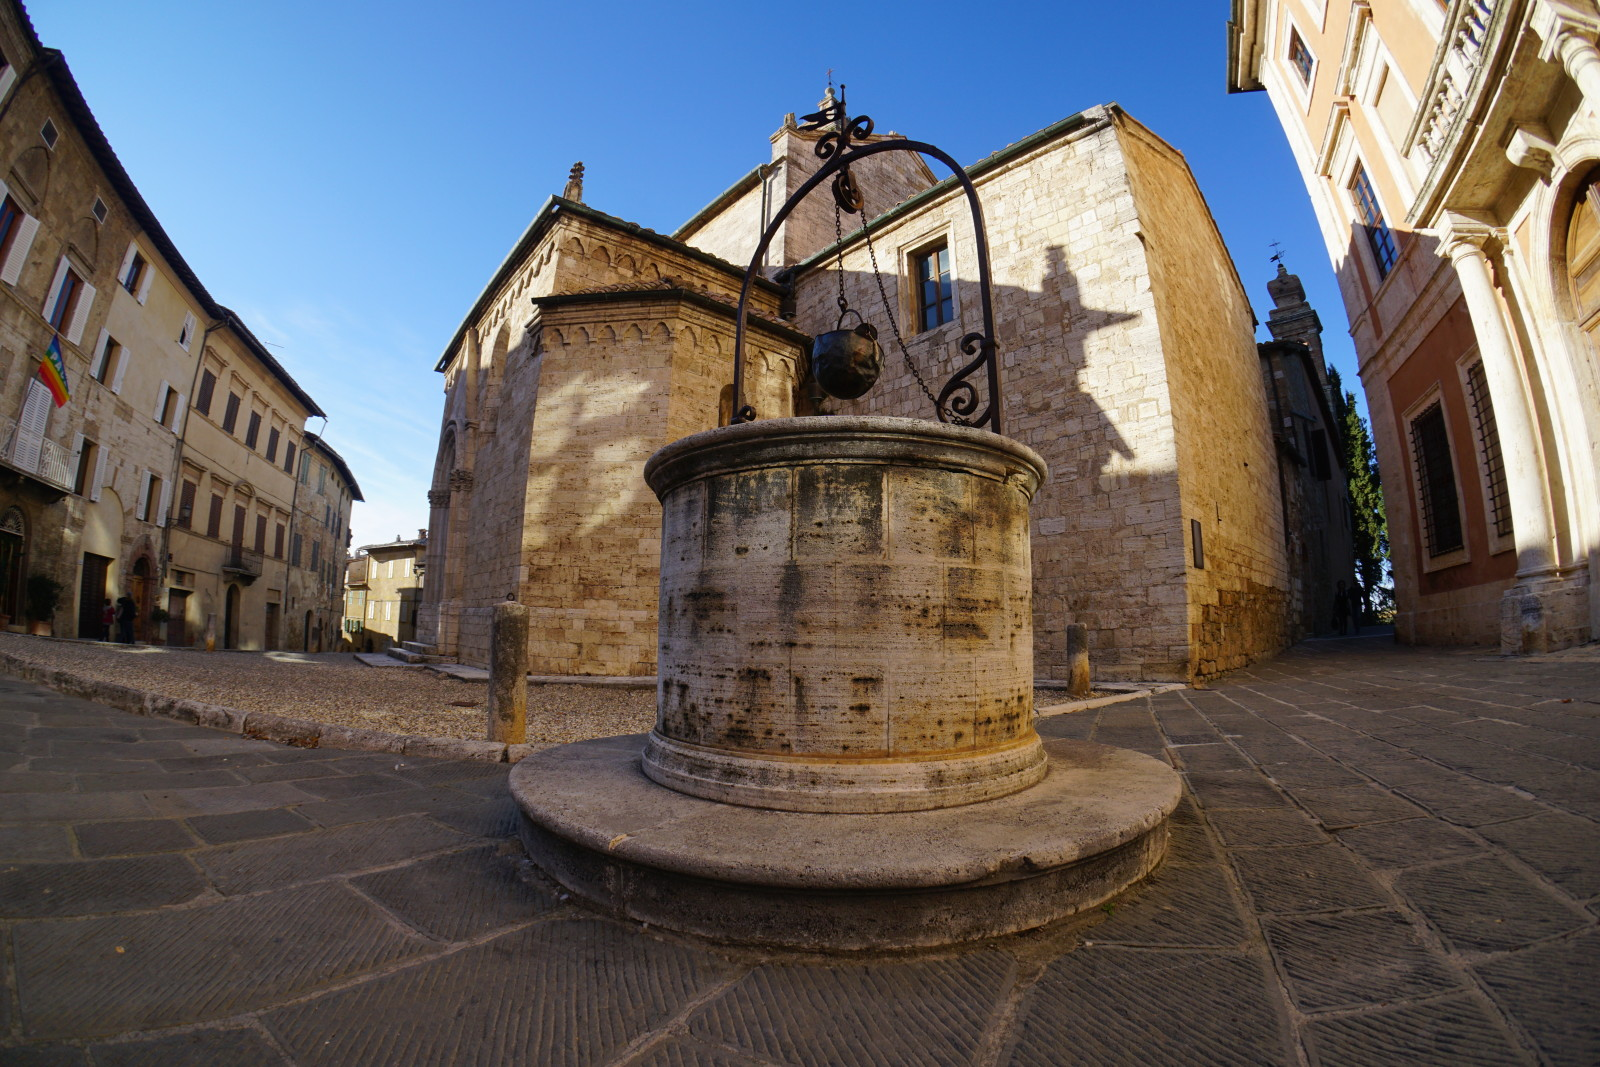 Chiesa san quirico d orcia toscana mercoled tutta la - Malta a novembre bagno ...